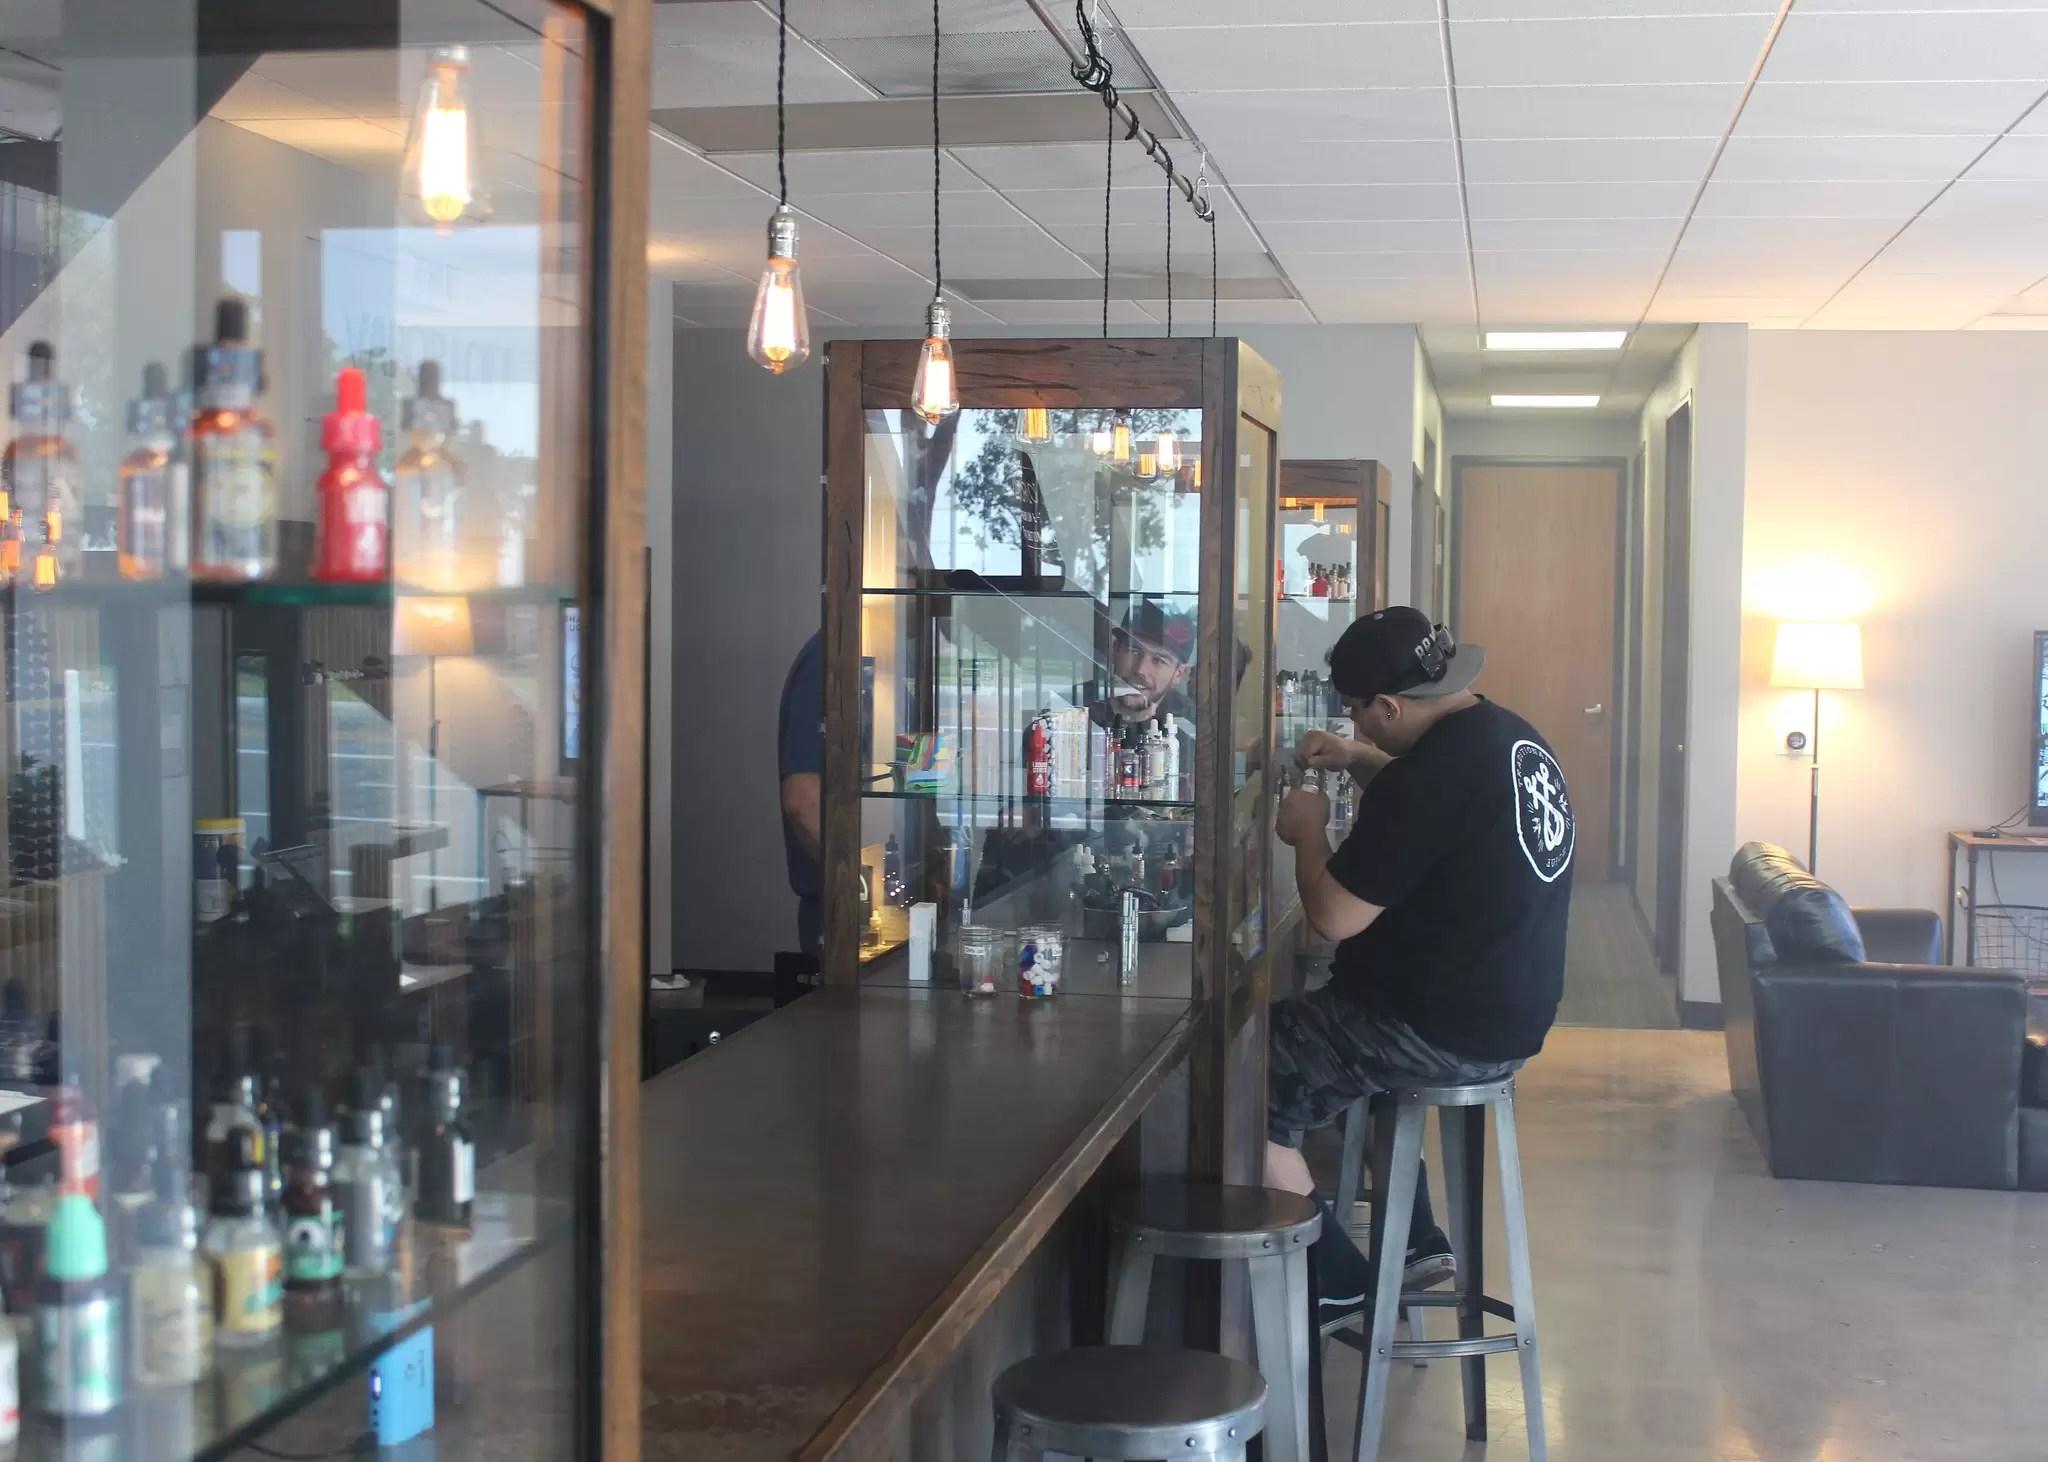 Washington vape shops go under after temporary flavour ban